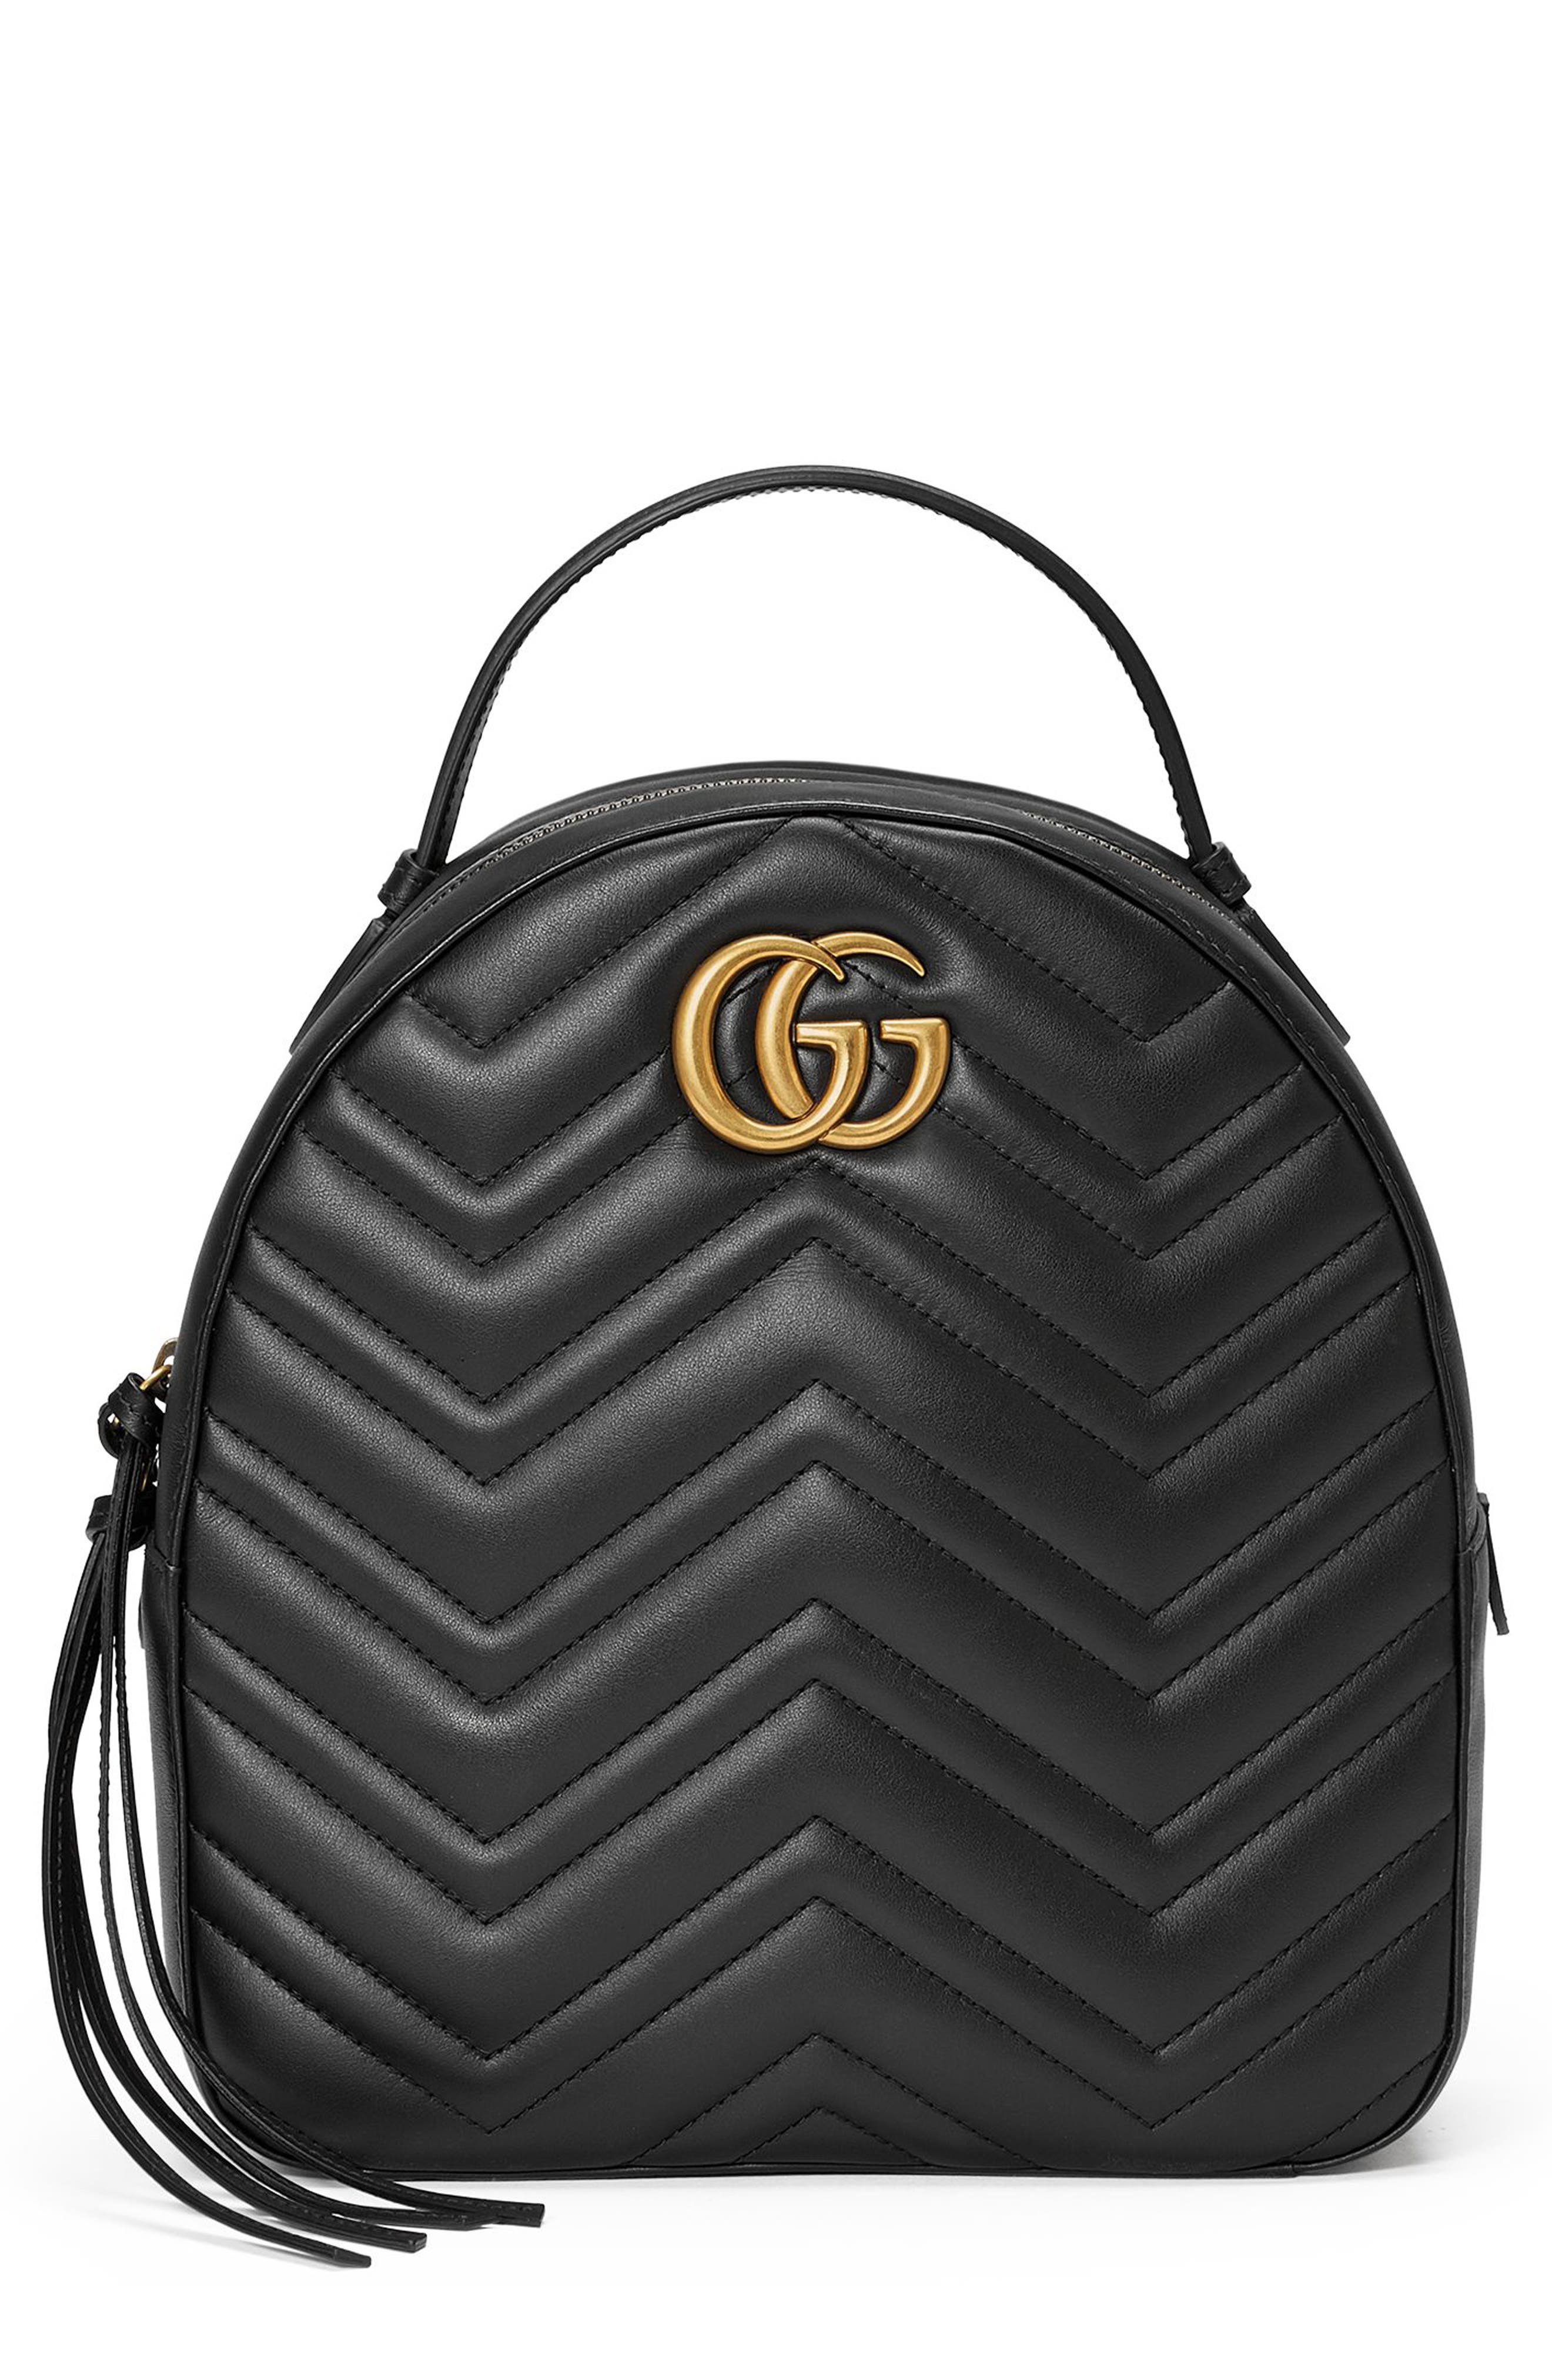 Womens Del Sol Backpacks, Black/Black/Black, One Size Rip Curl